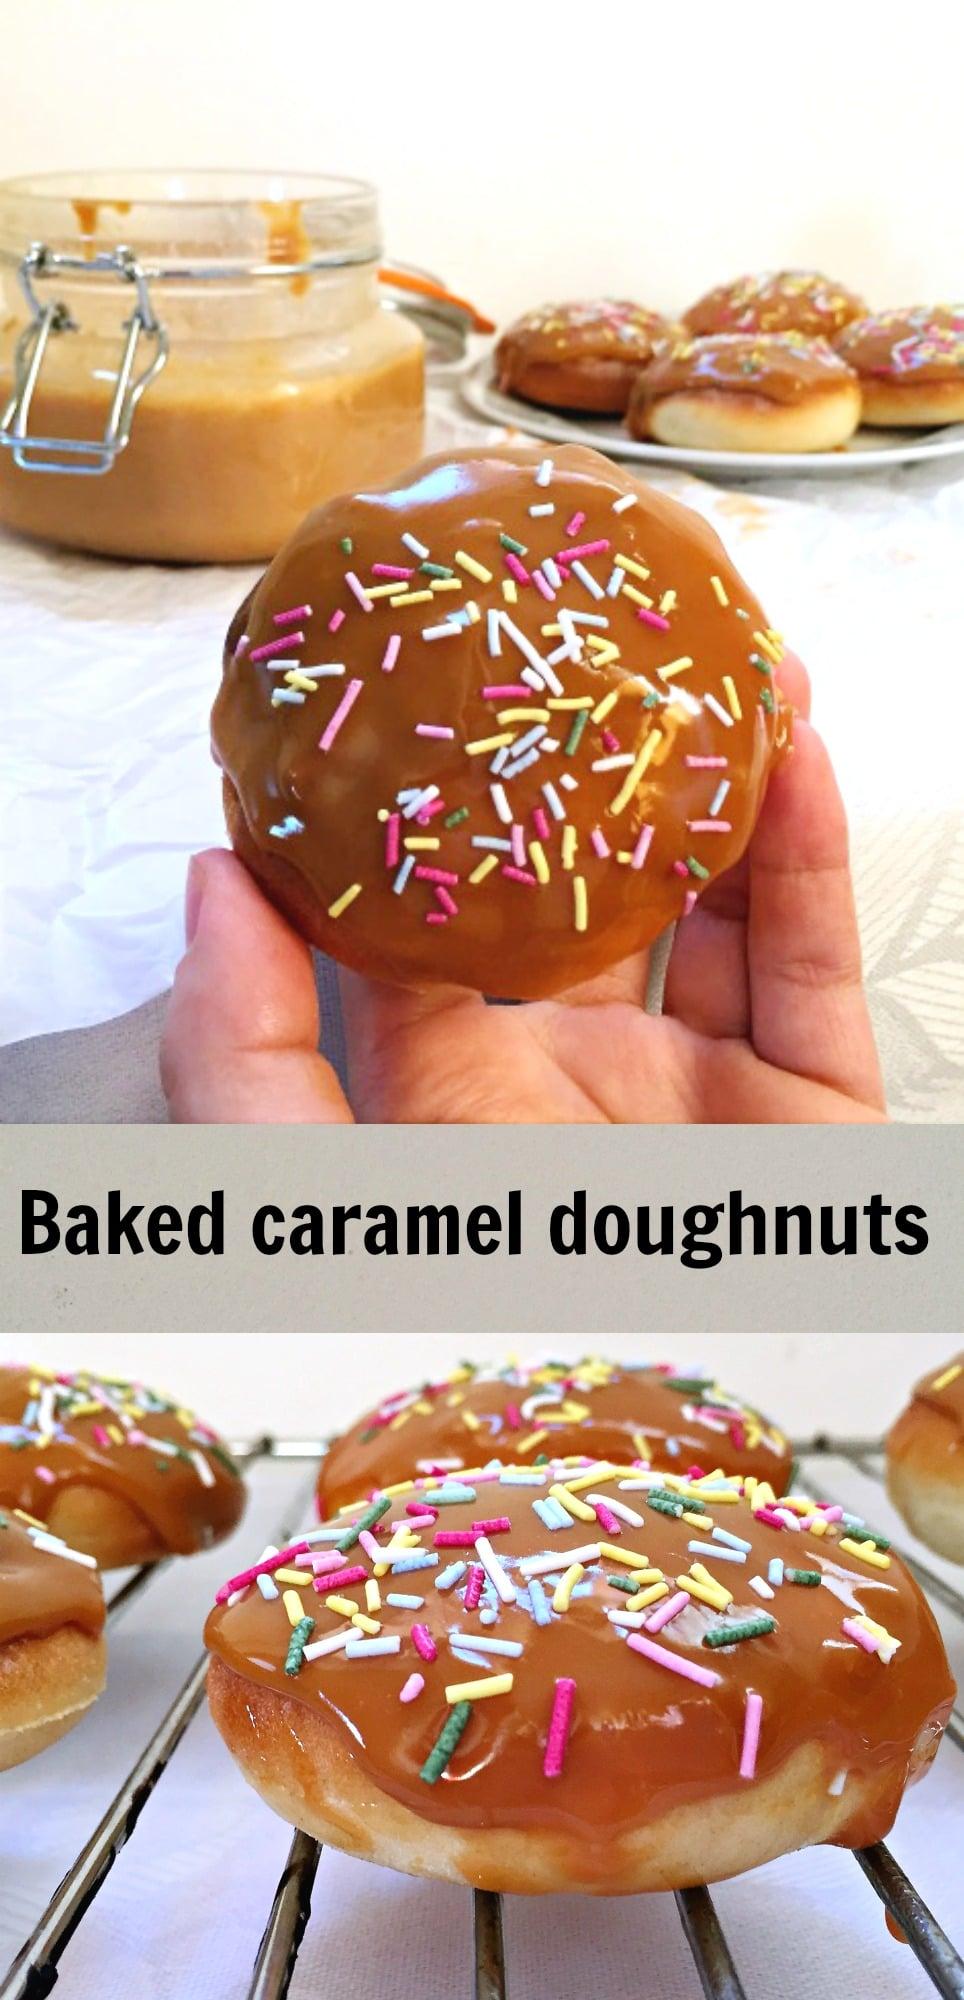 Baked salted caramel doughnuts